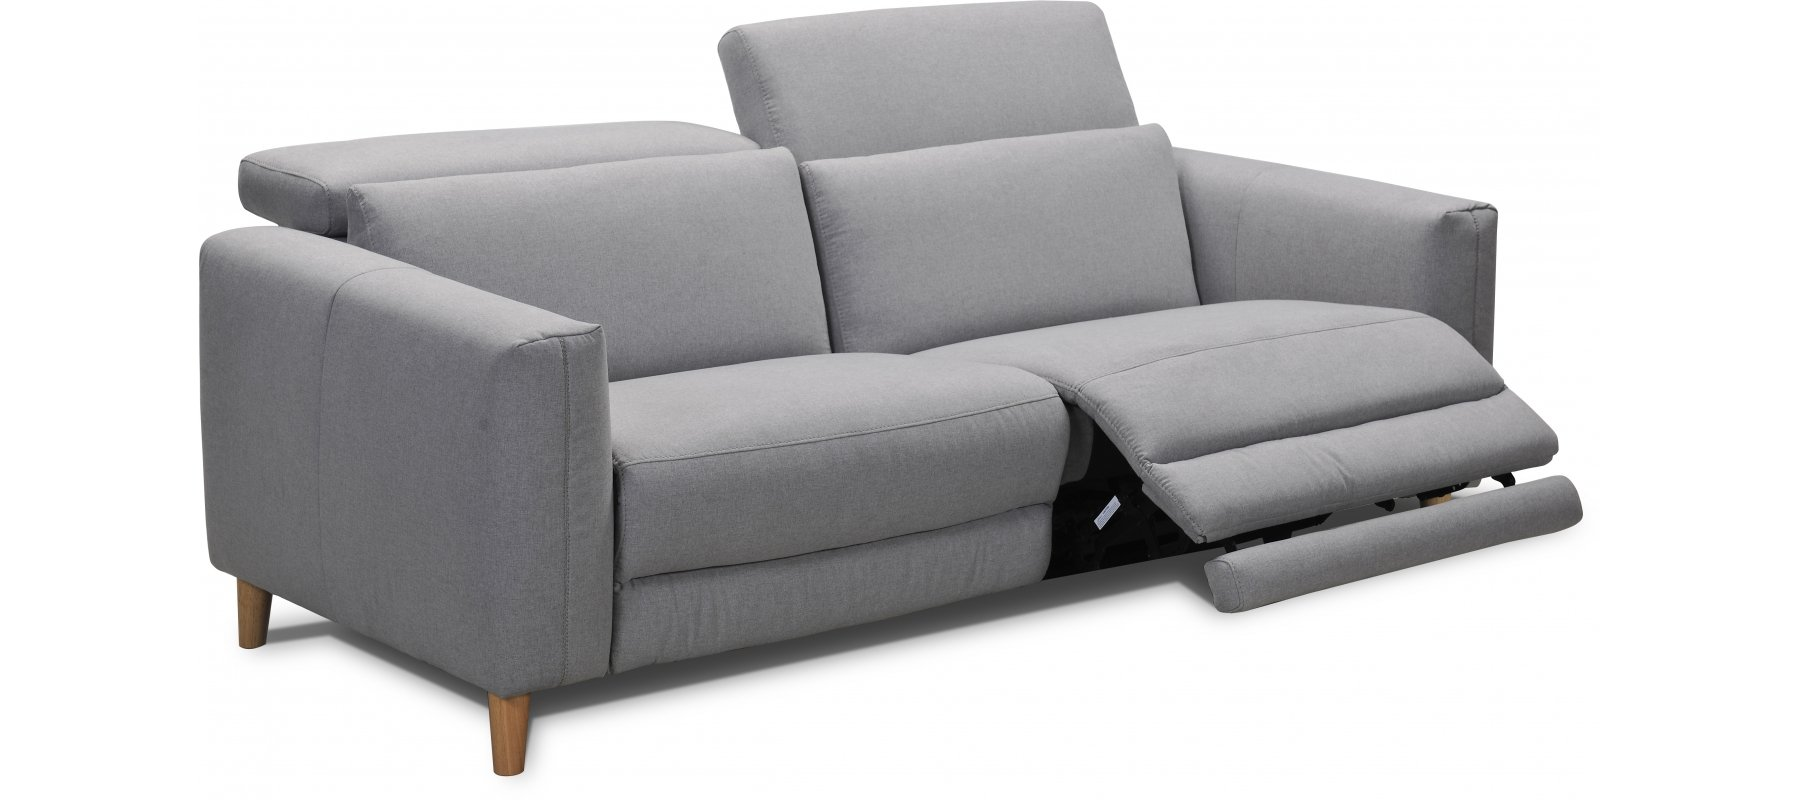 canap 2 places fixe montana relax lectrique avec. Black Bedroom Furniture Sets. Home Design Ideas